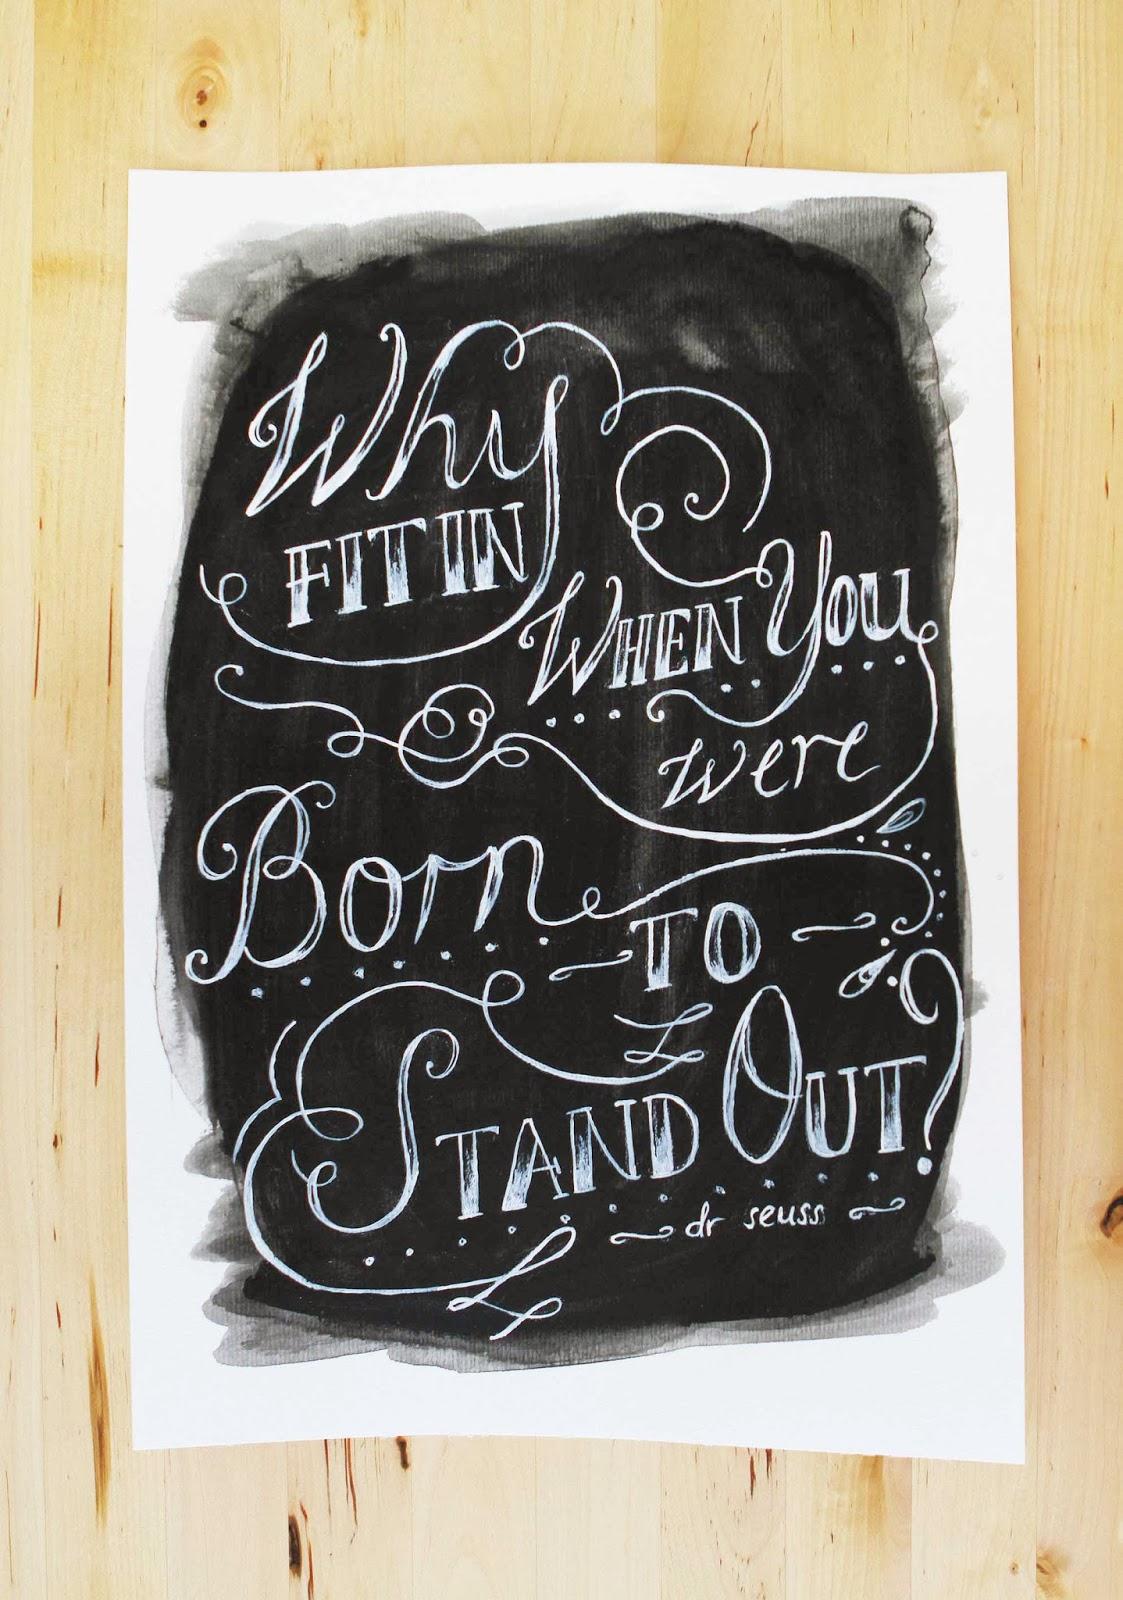 chalkbaord lettering vintage writing original painting artwork sail and swan